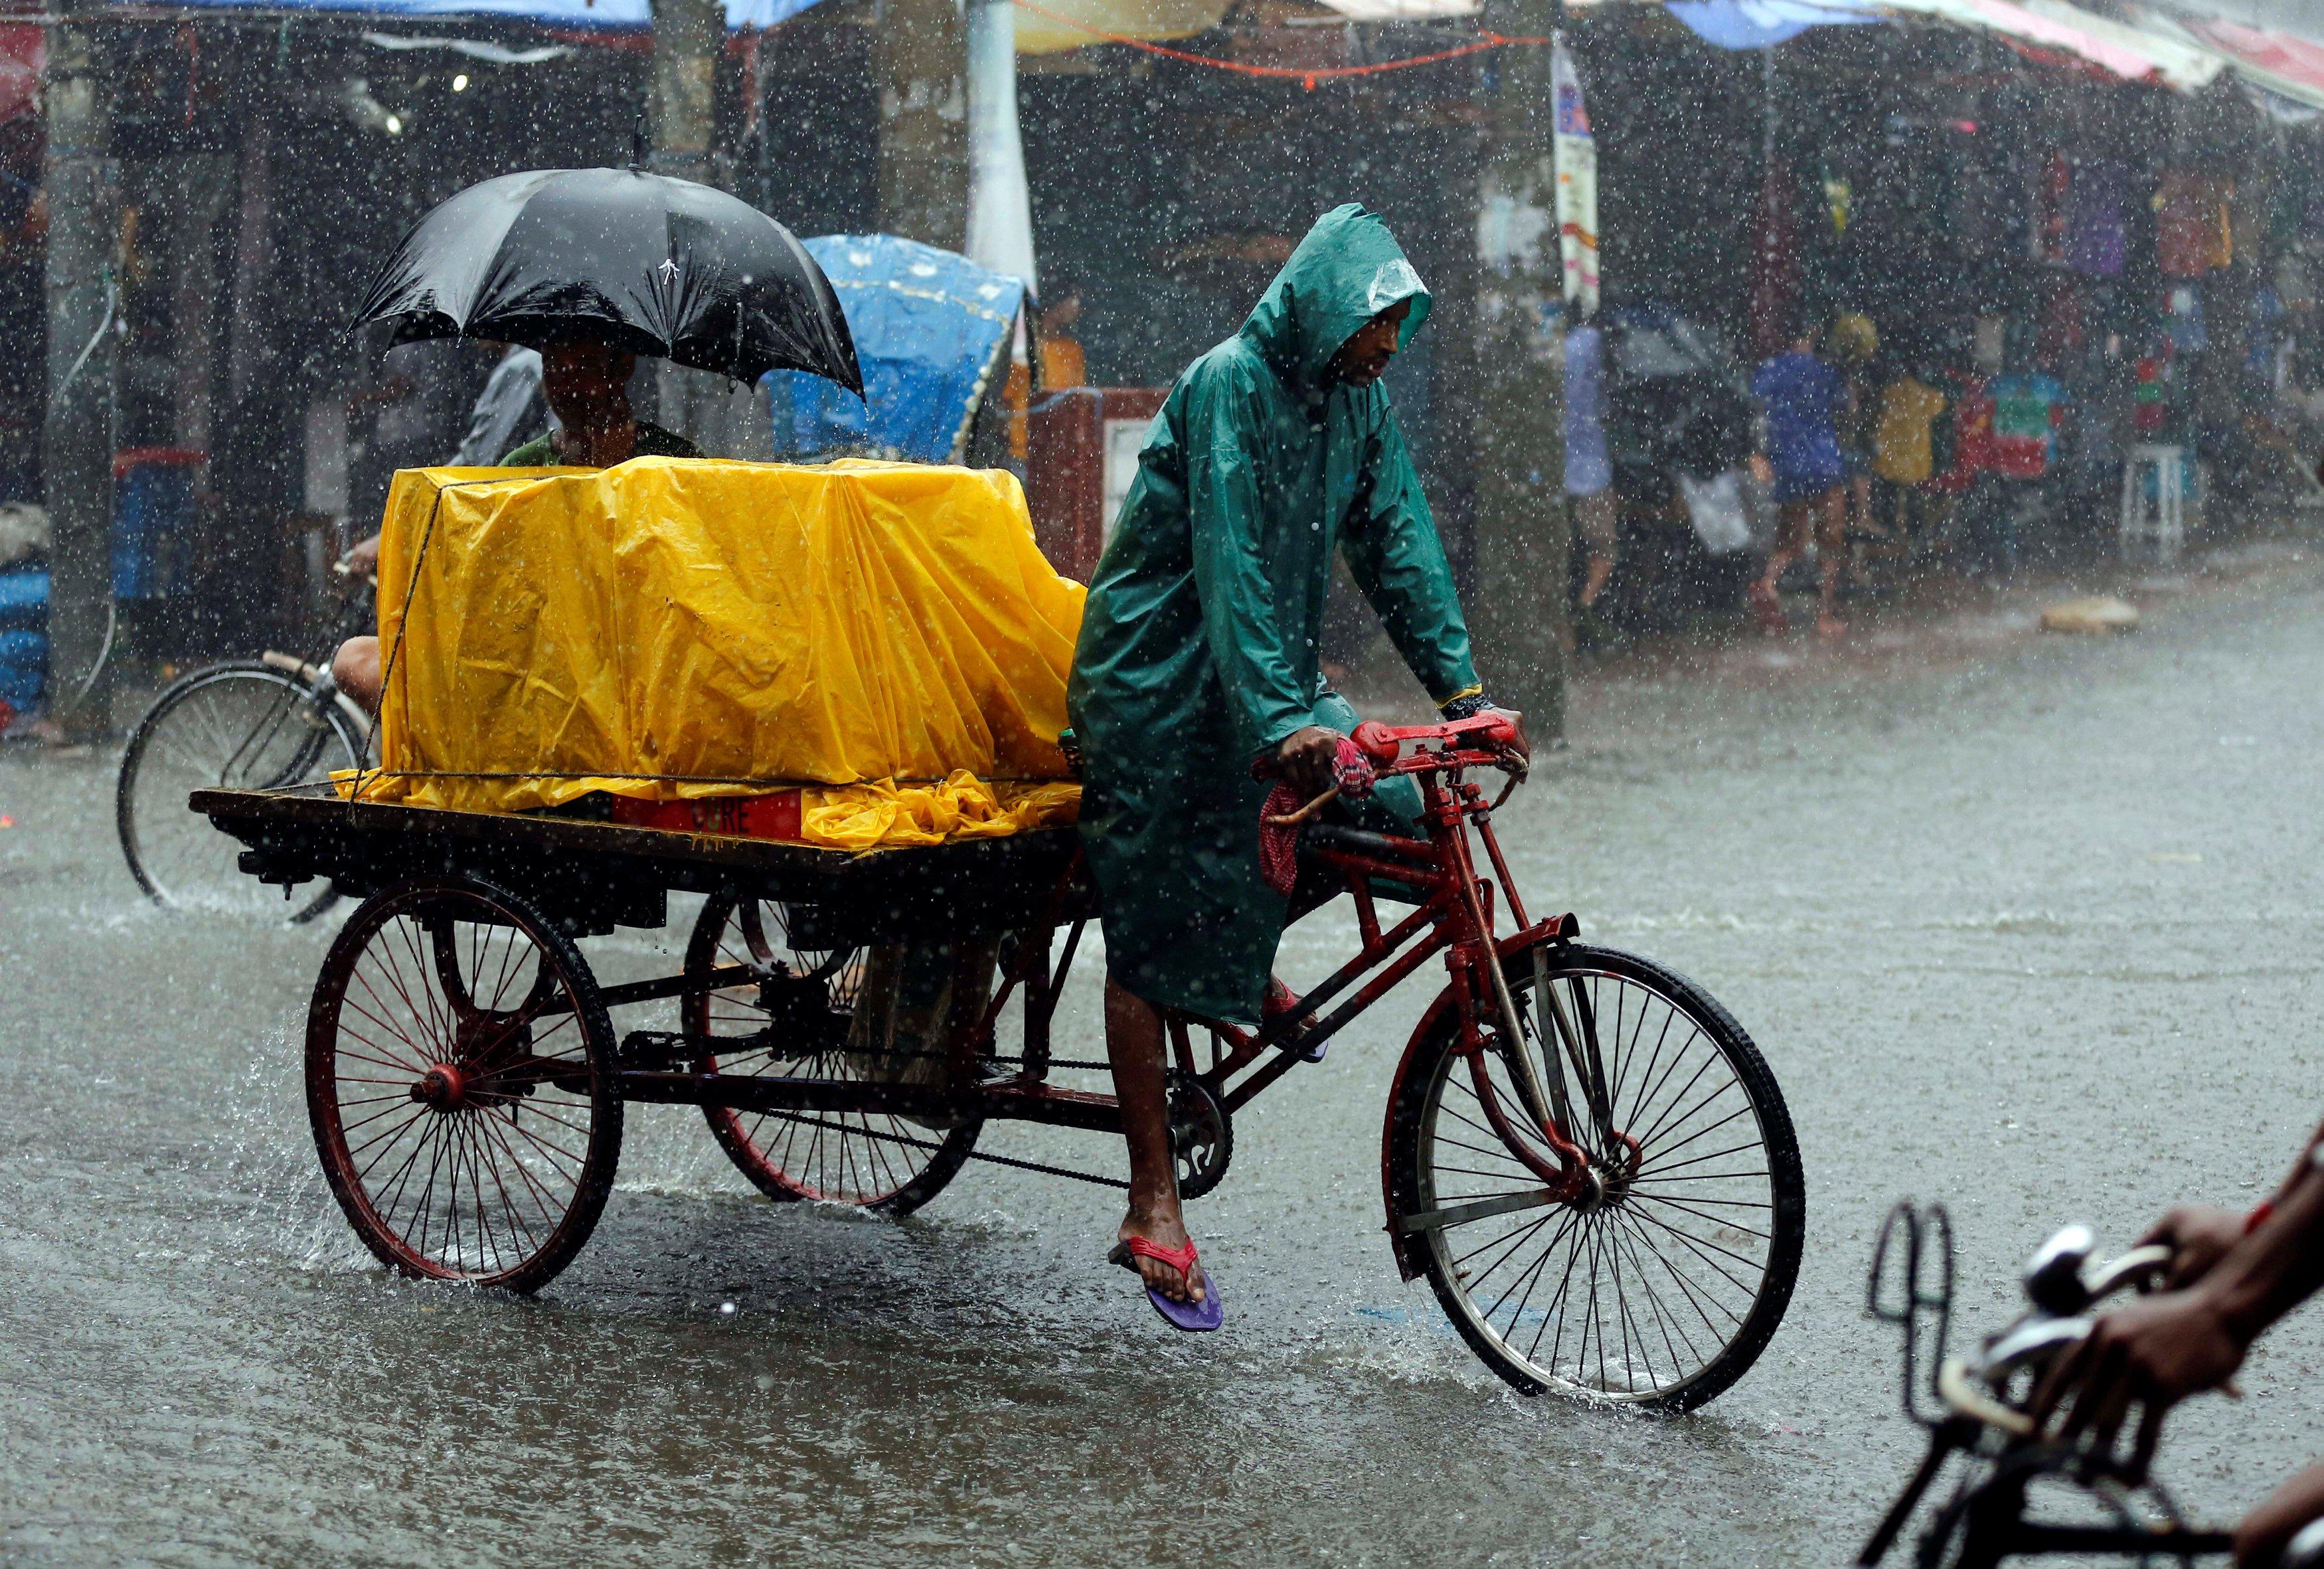 A person drives a van during heavy rain in Dhaka, Bangladesh July 26, 2017. REUTERS/Mohammad Ponir Hossain